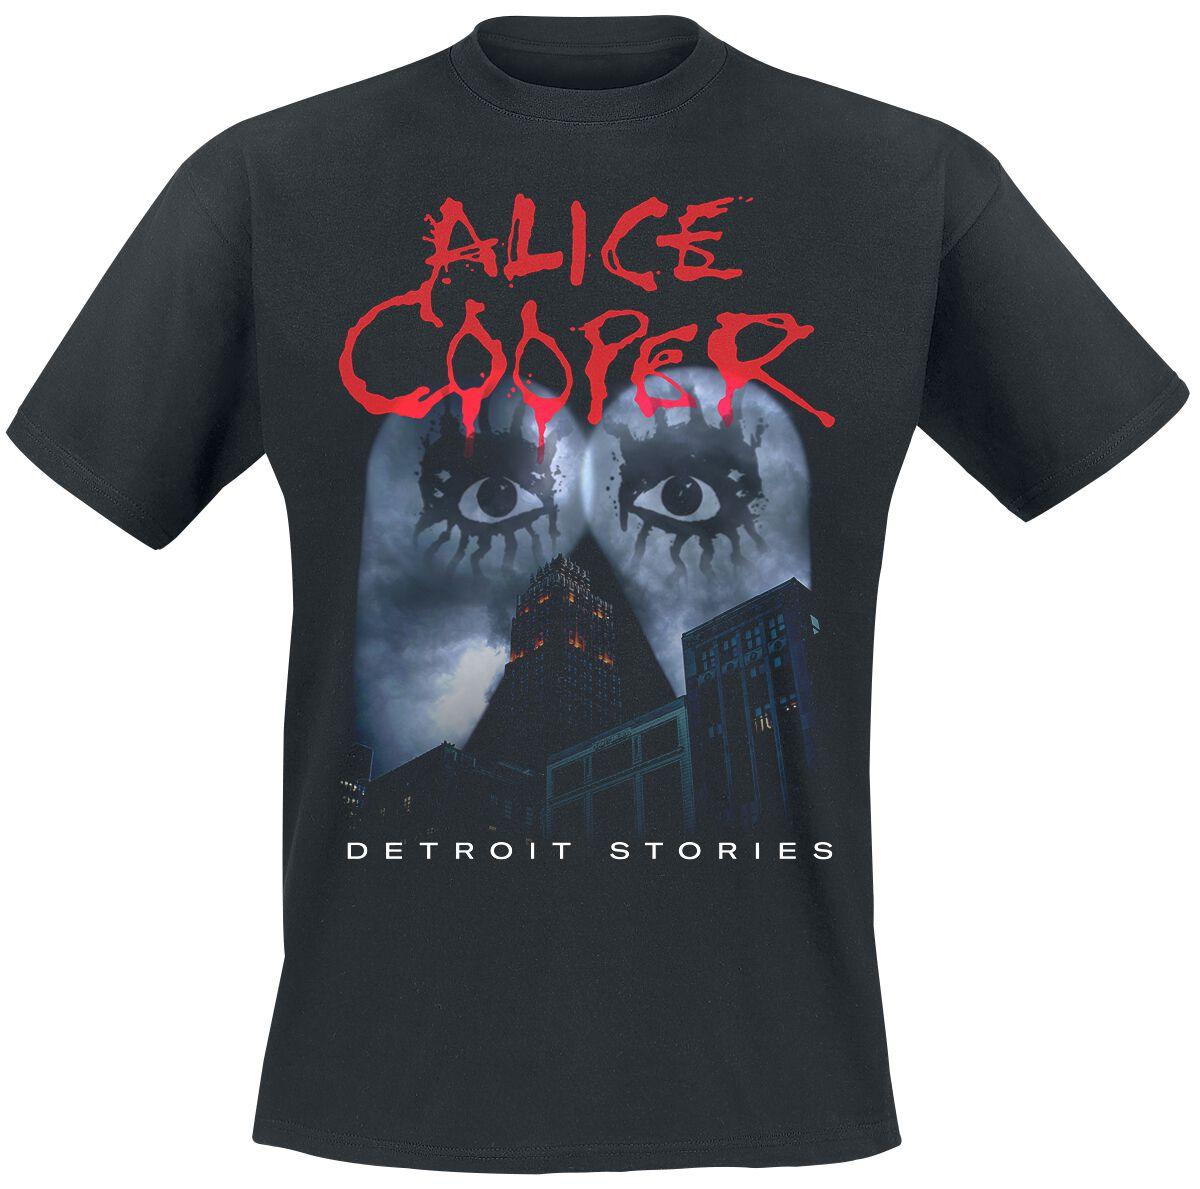 Image of Alice Cooper Detroit Stories T-Shirt schwarz